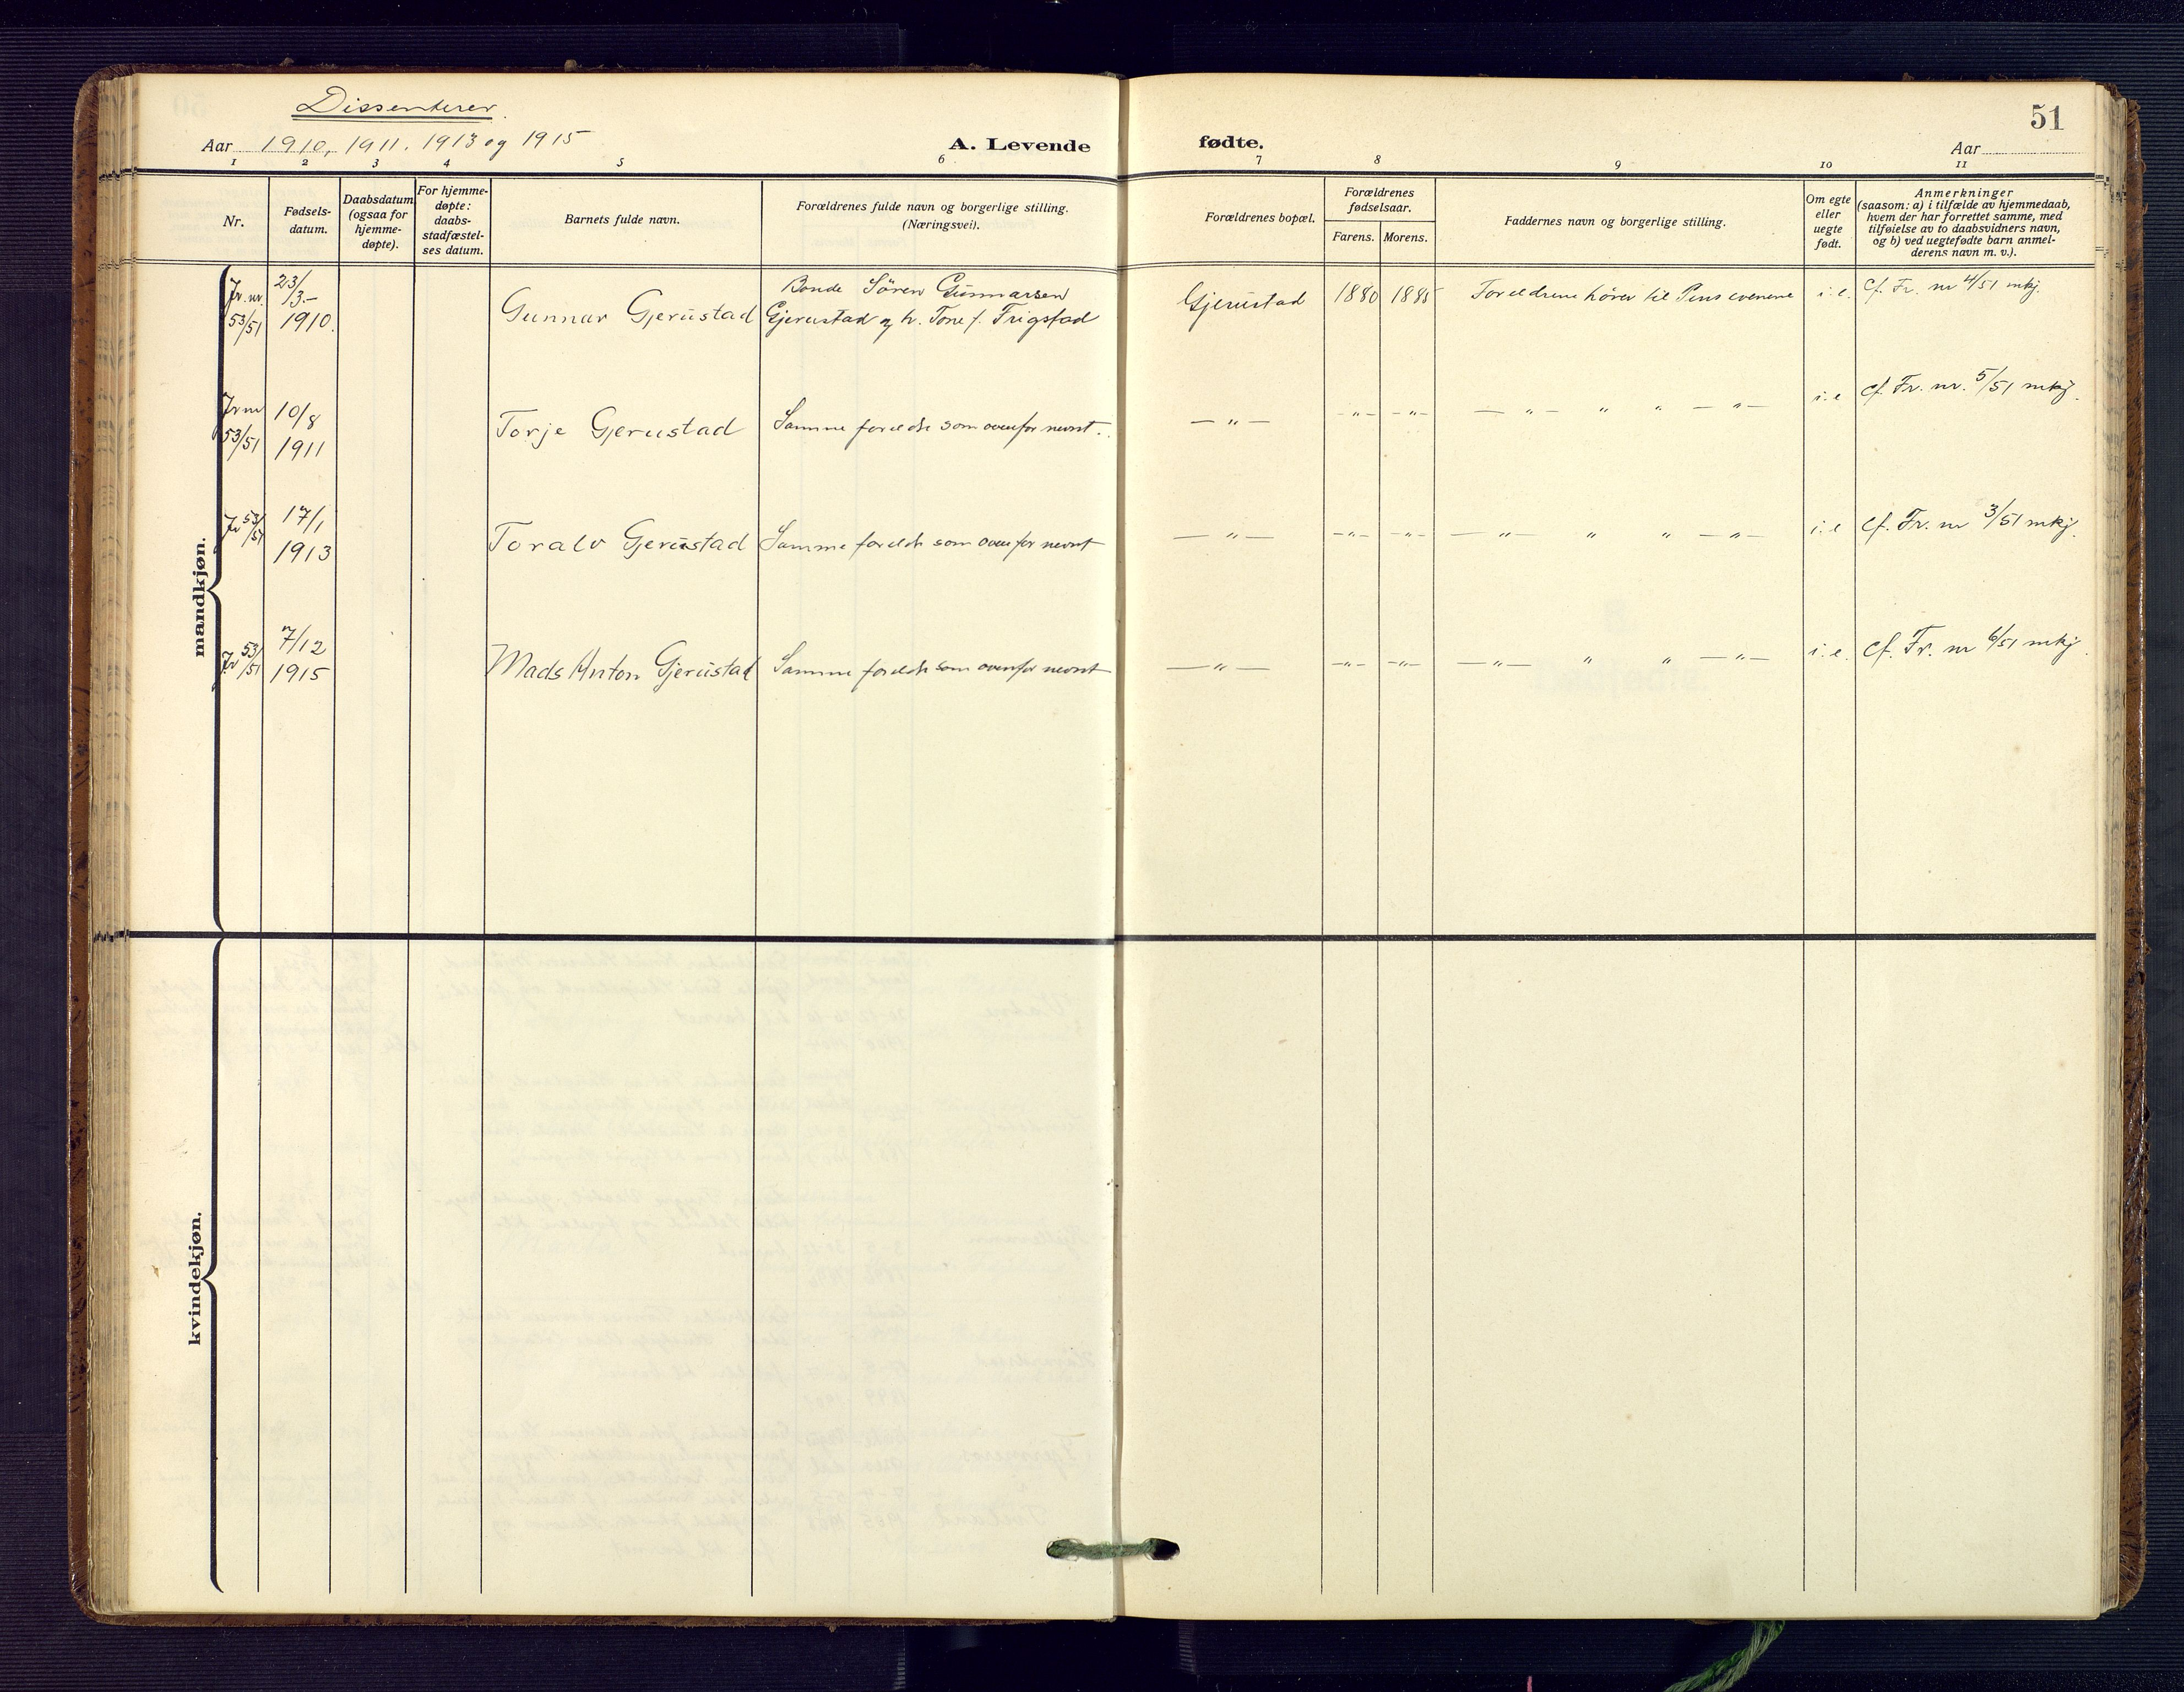 SAK, Herefoss sokneprestkontor, F/Fa/Fab/L0005: Ministerialbok nr. A 5, 1910-1932, s. 51